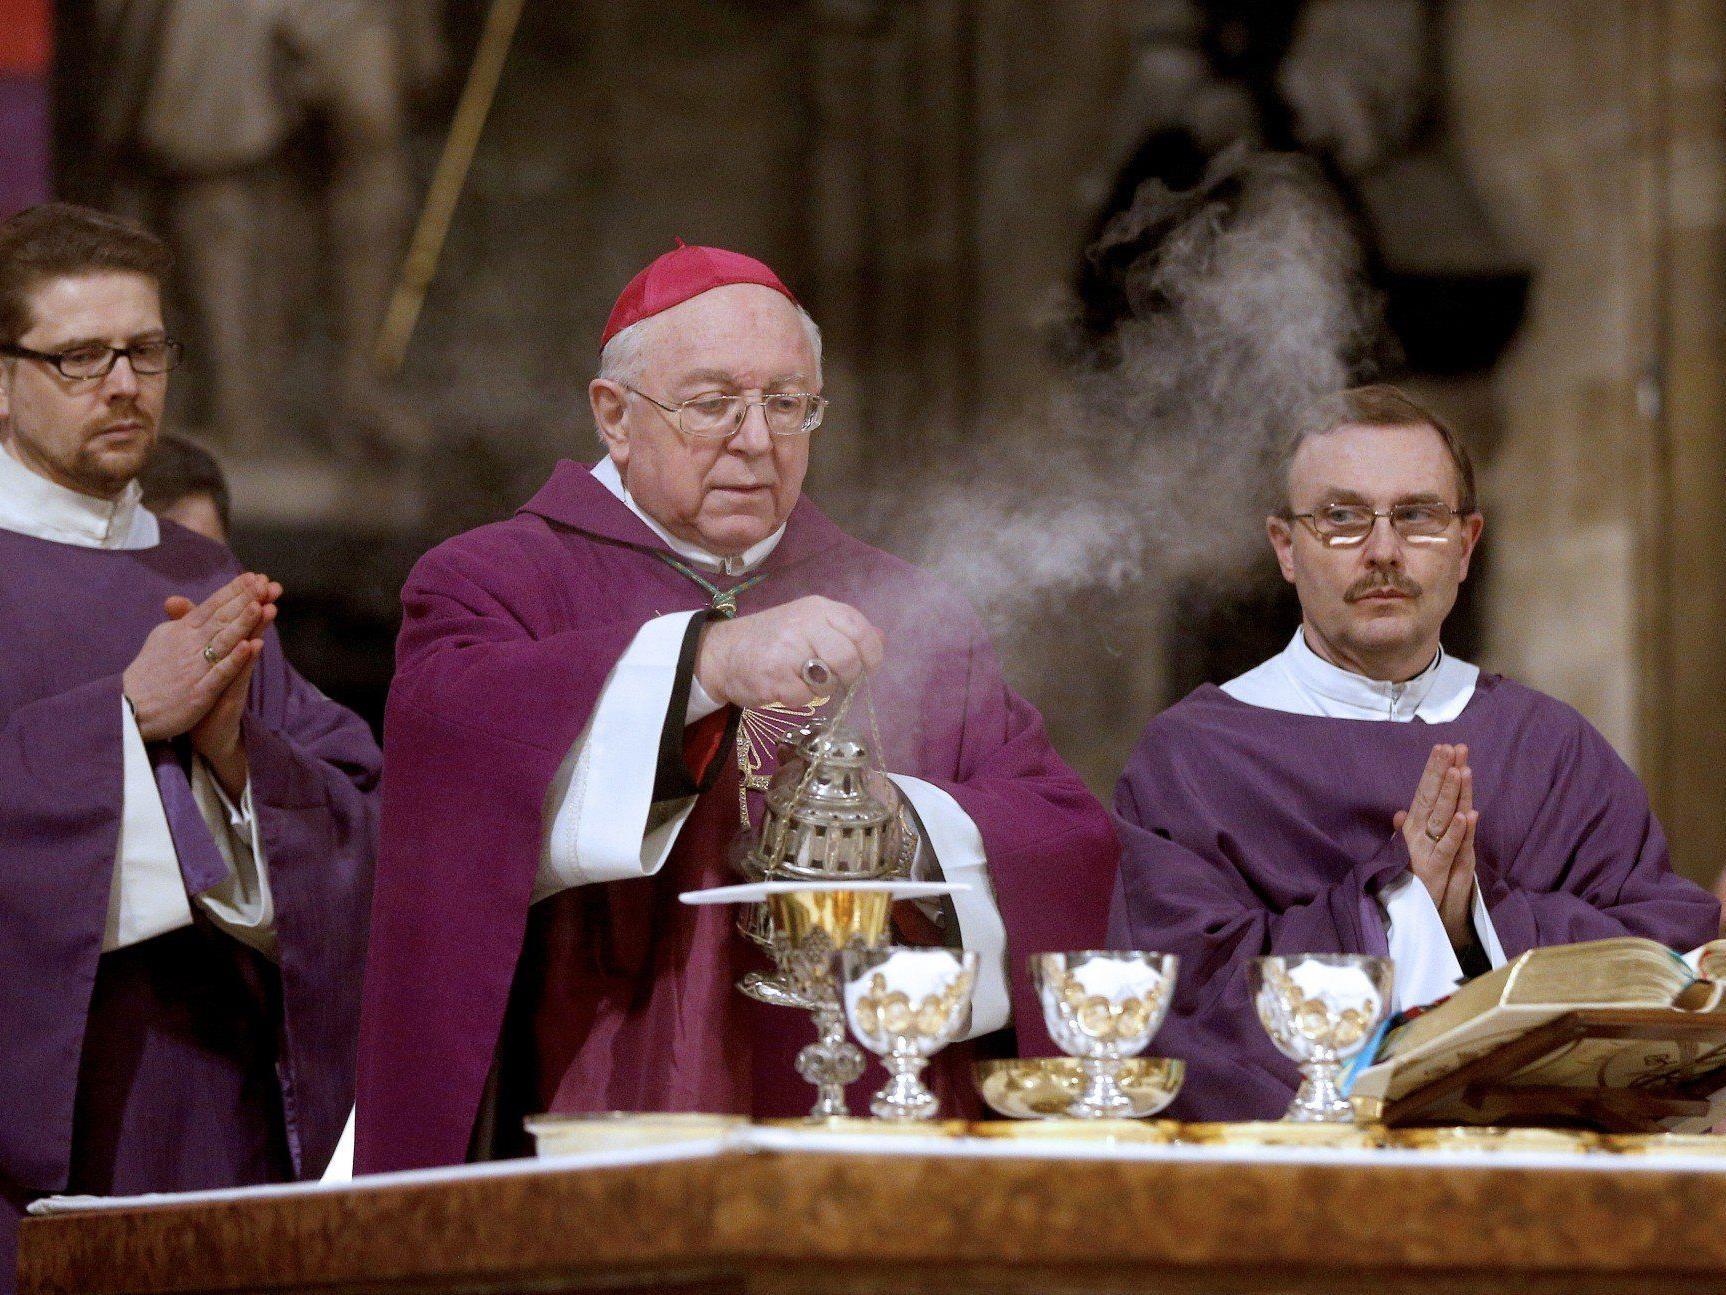 Papst tritt zurück: Dankmesse am 28. Februar im Wiener Stephansdom